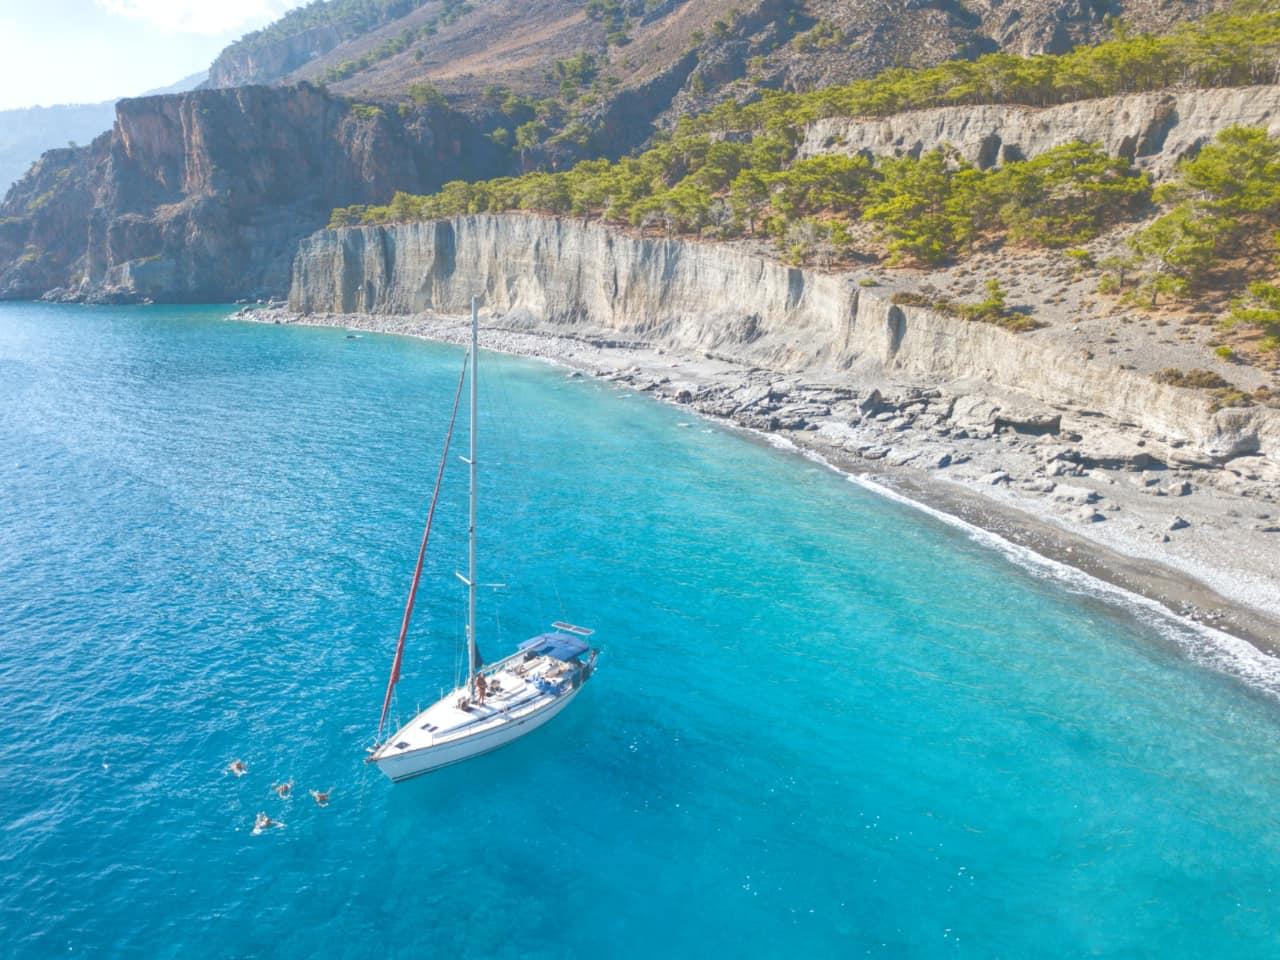 sailing trips south chania crete, sailing trips loutro sfakia, sailing trips samaria gorge crete